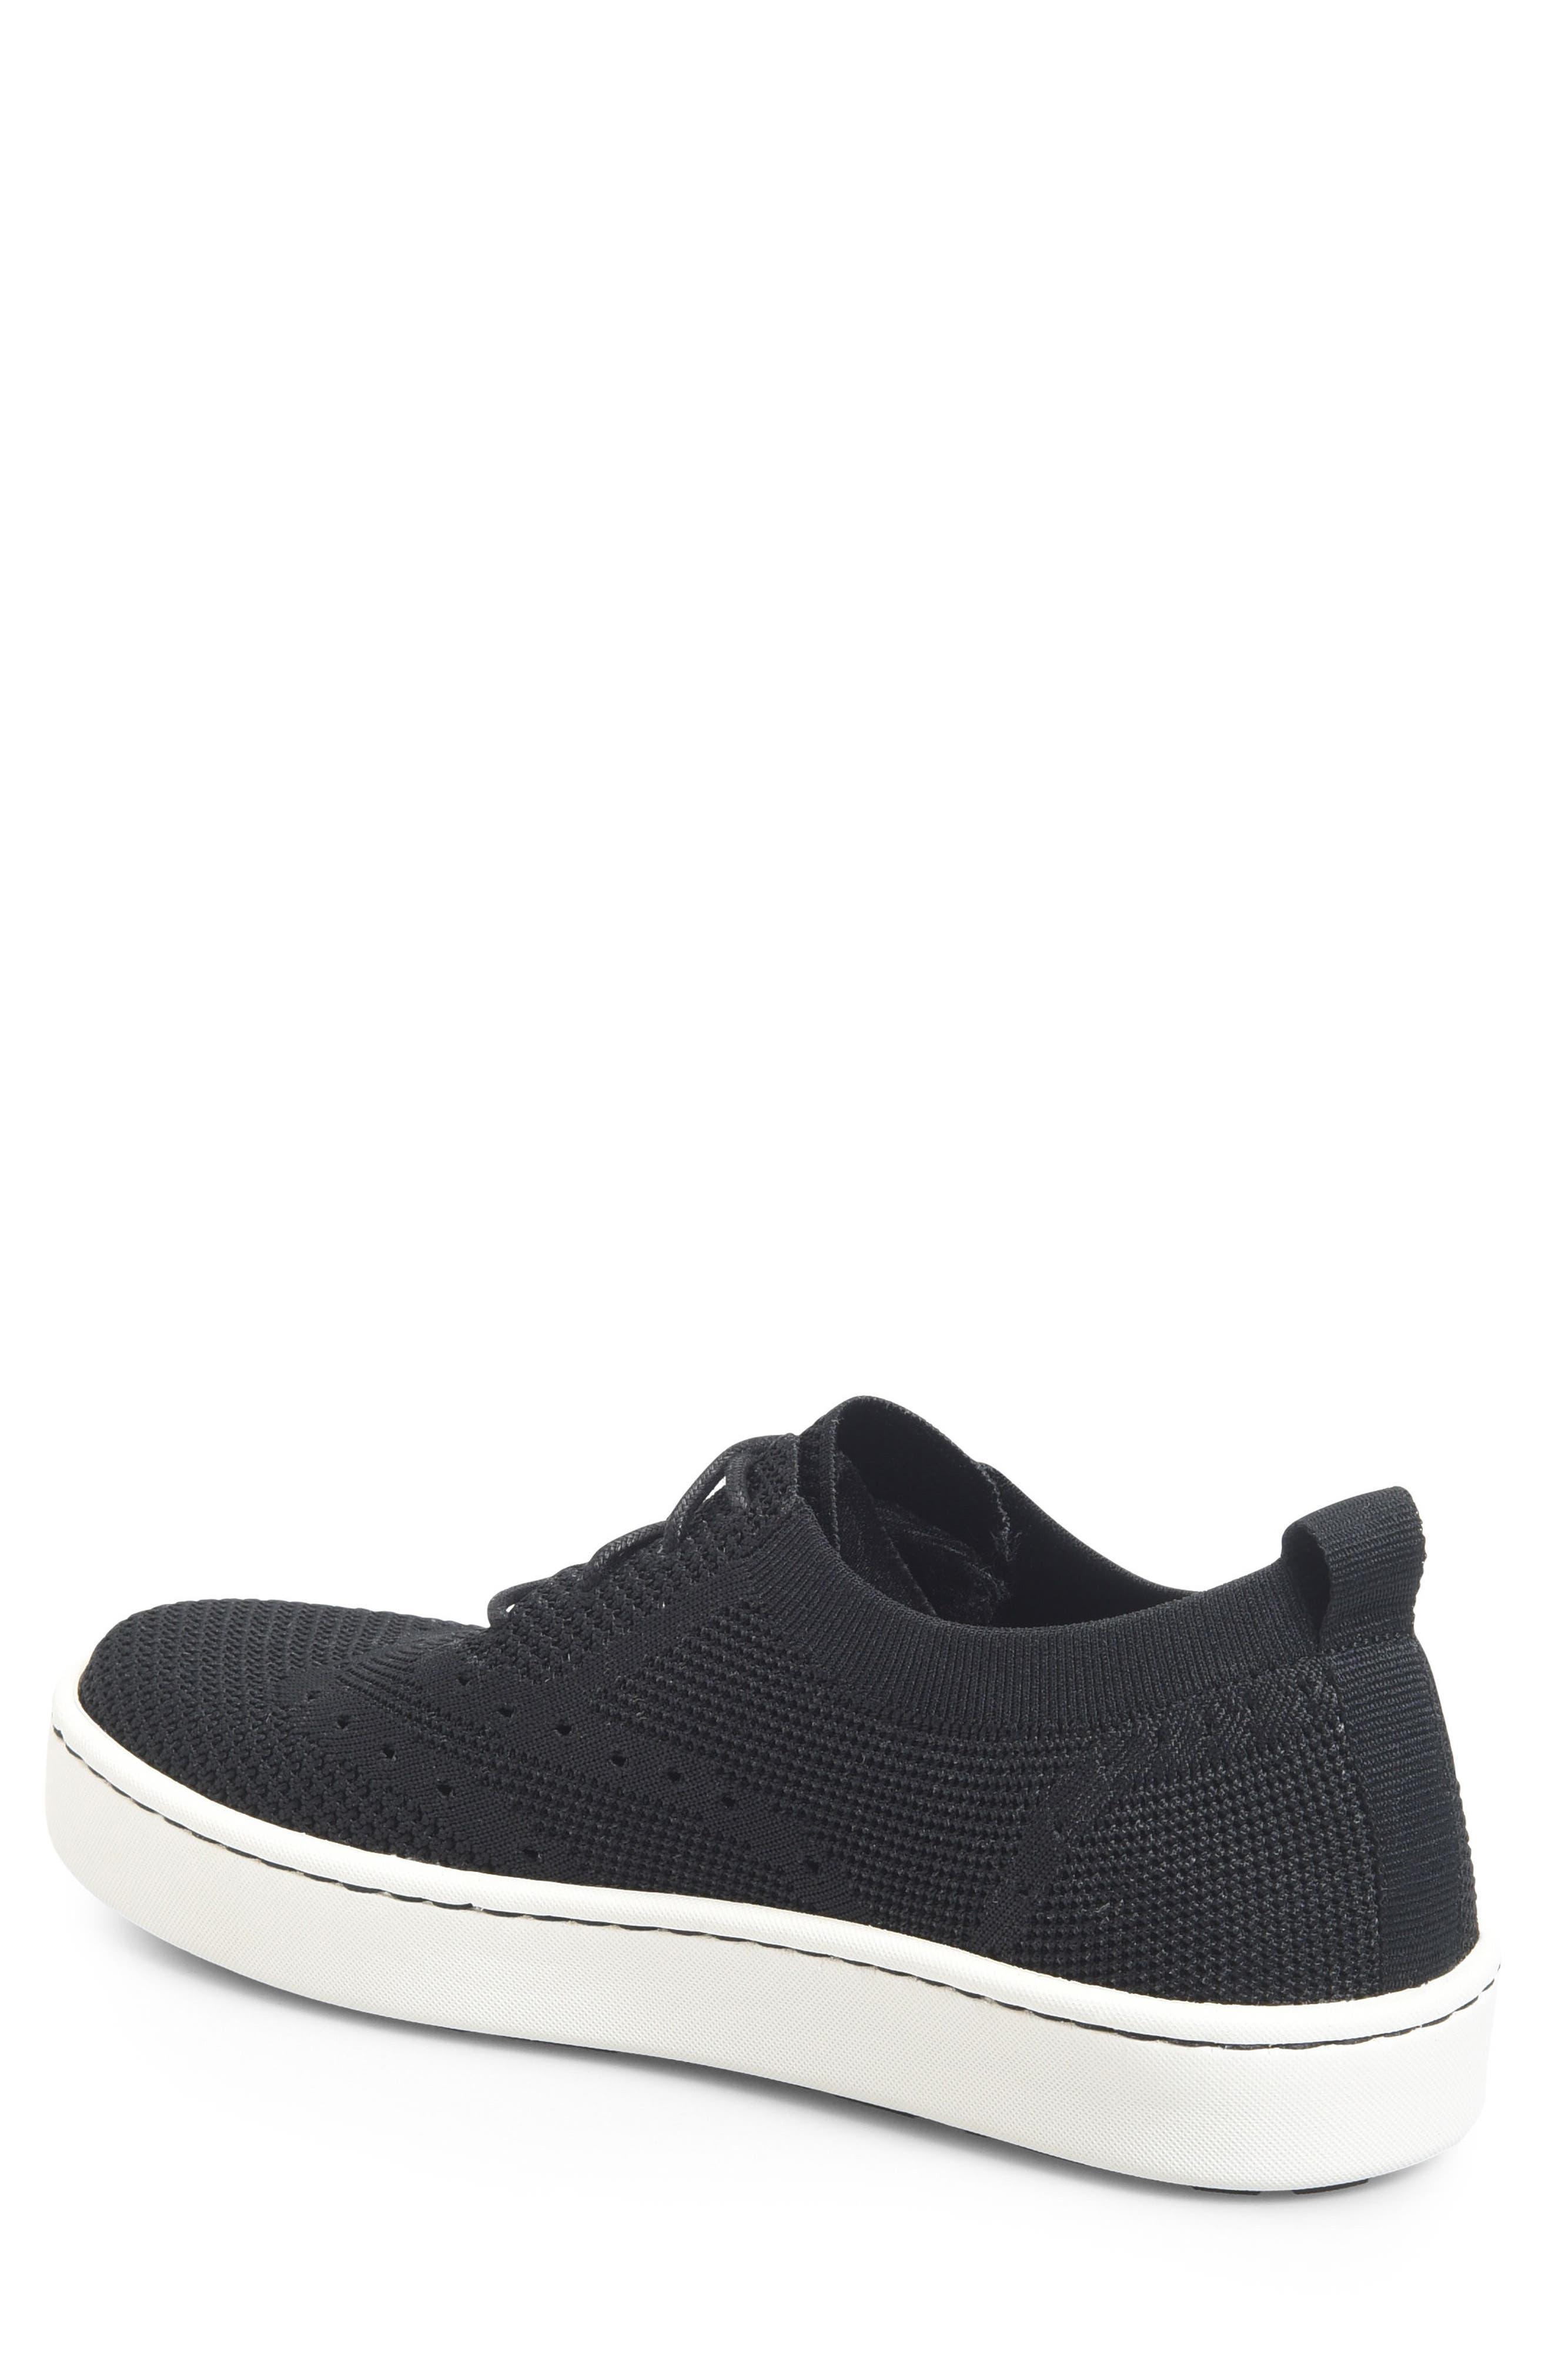 Bearse Sneaker,                             Alternate thumbnail 2, color,                             Black Knit